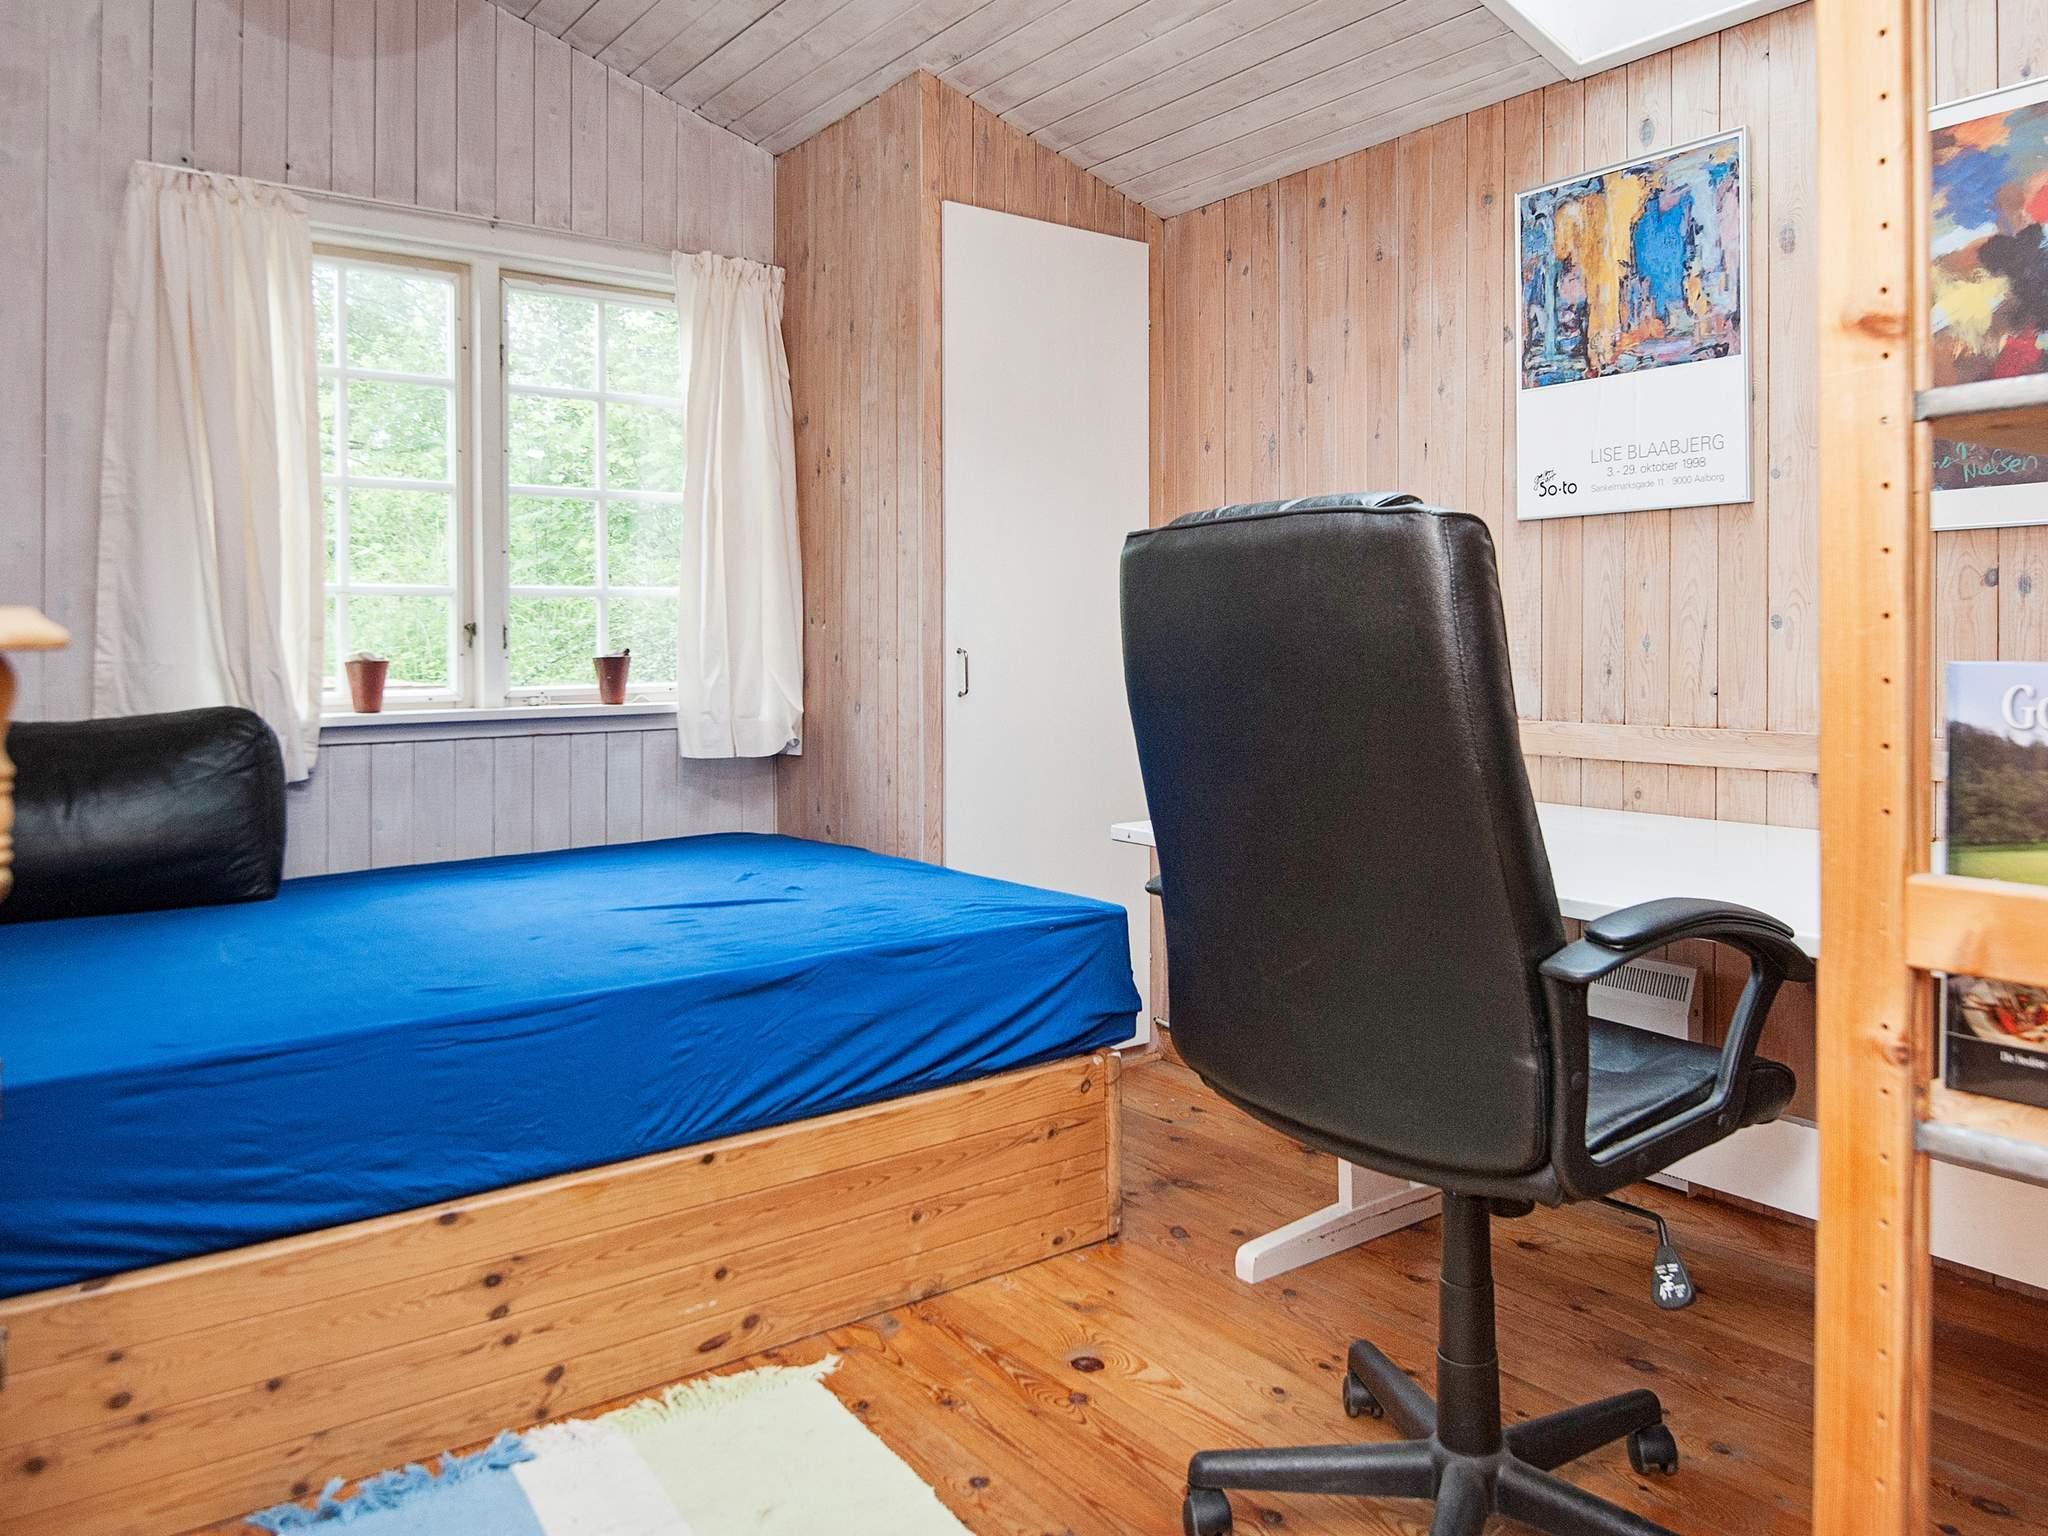 Maison de vacances Helgenæs (2354348), Knebel, , Mer Baltique danoise, Danemark, image 10